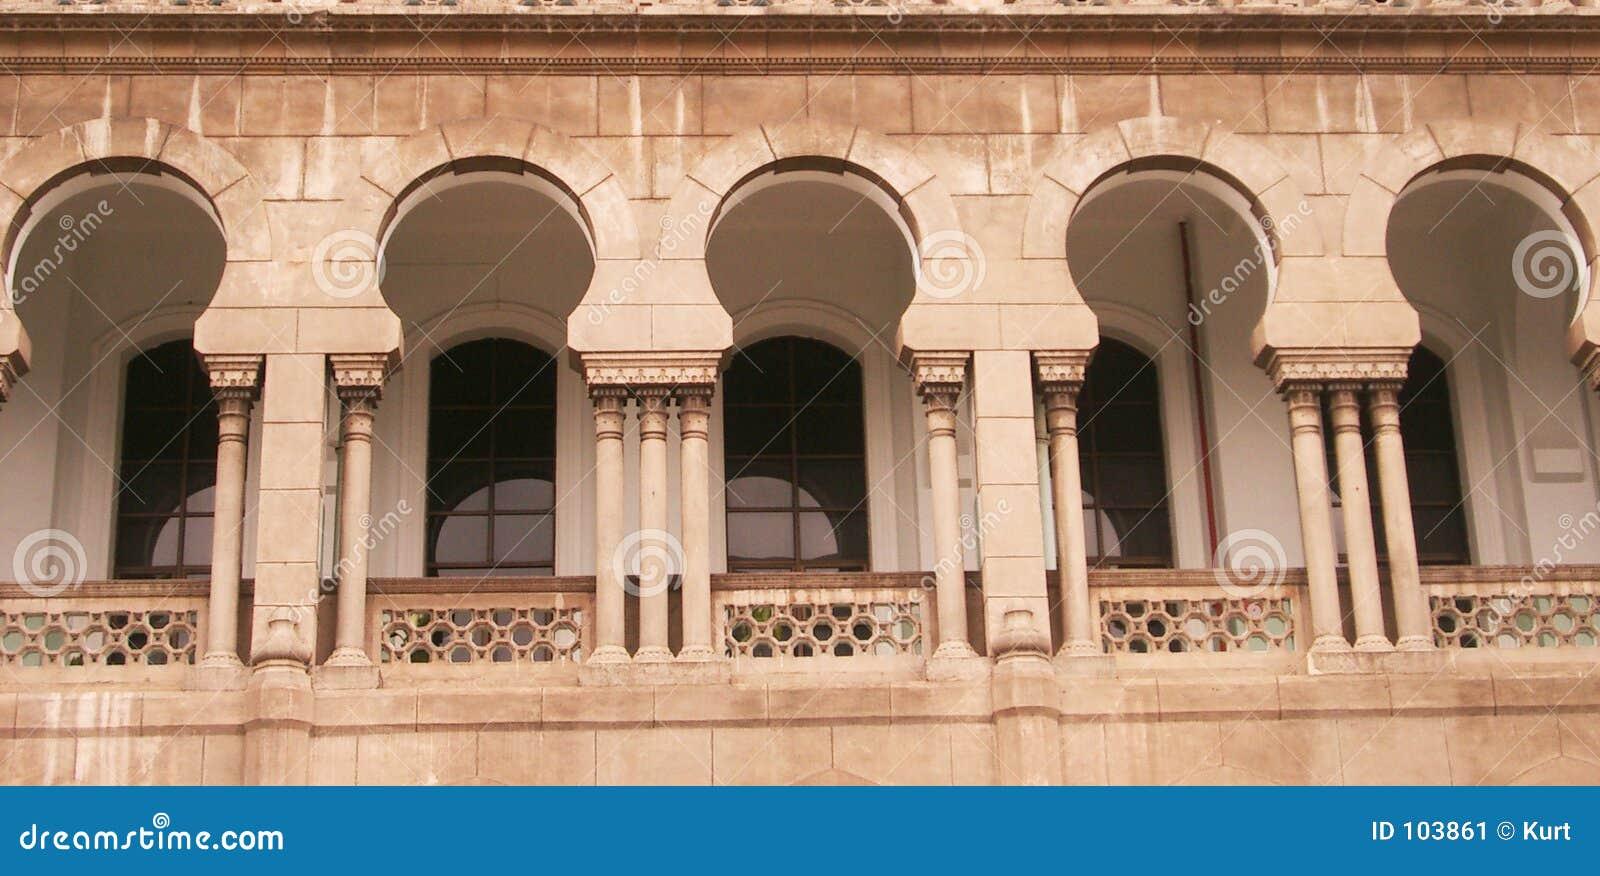 Islamic windows